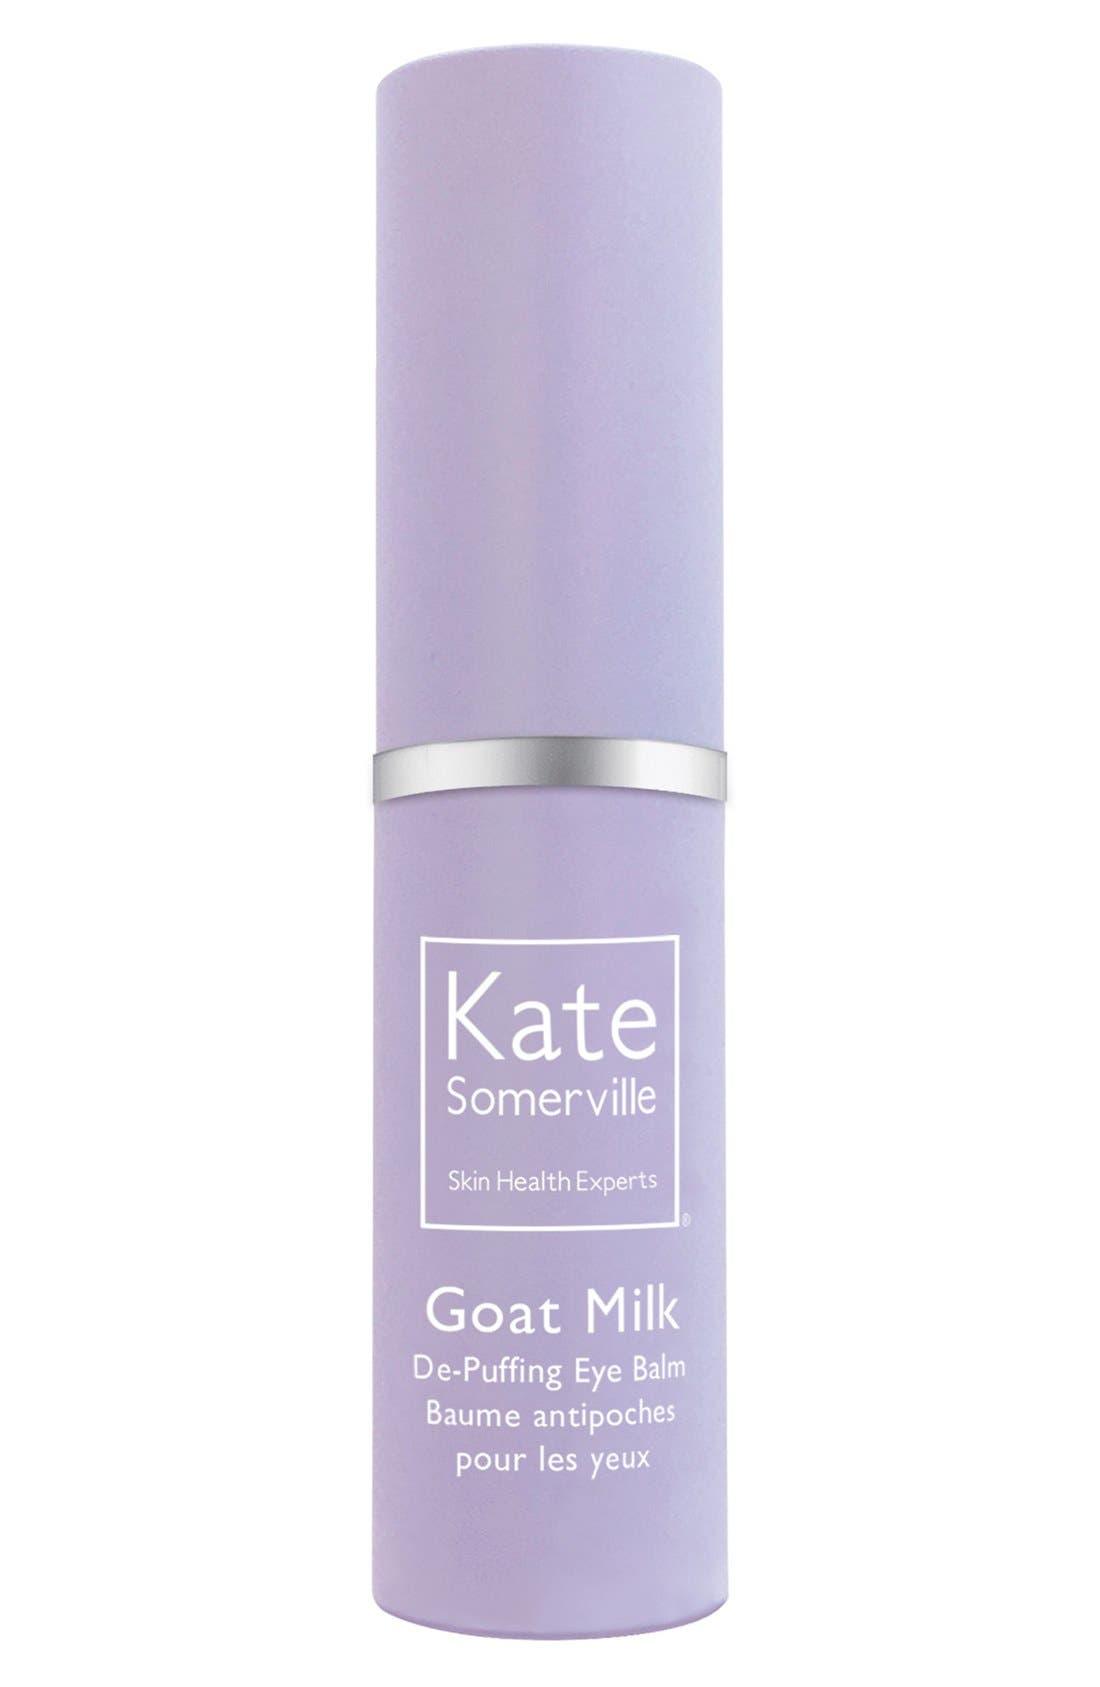 Kate Somerville Goat Milk De Puffing Eye Balm Nordstrom